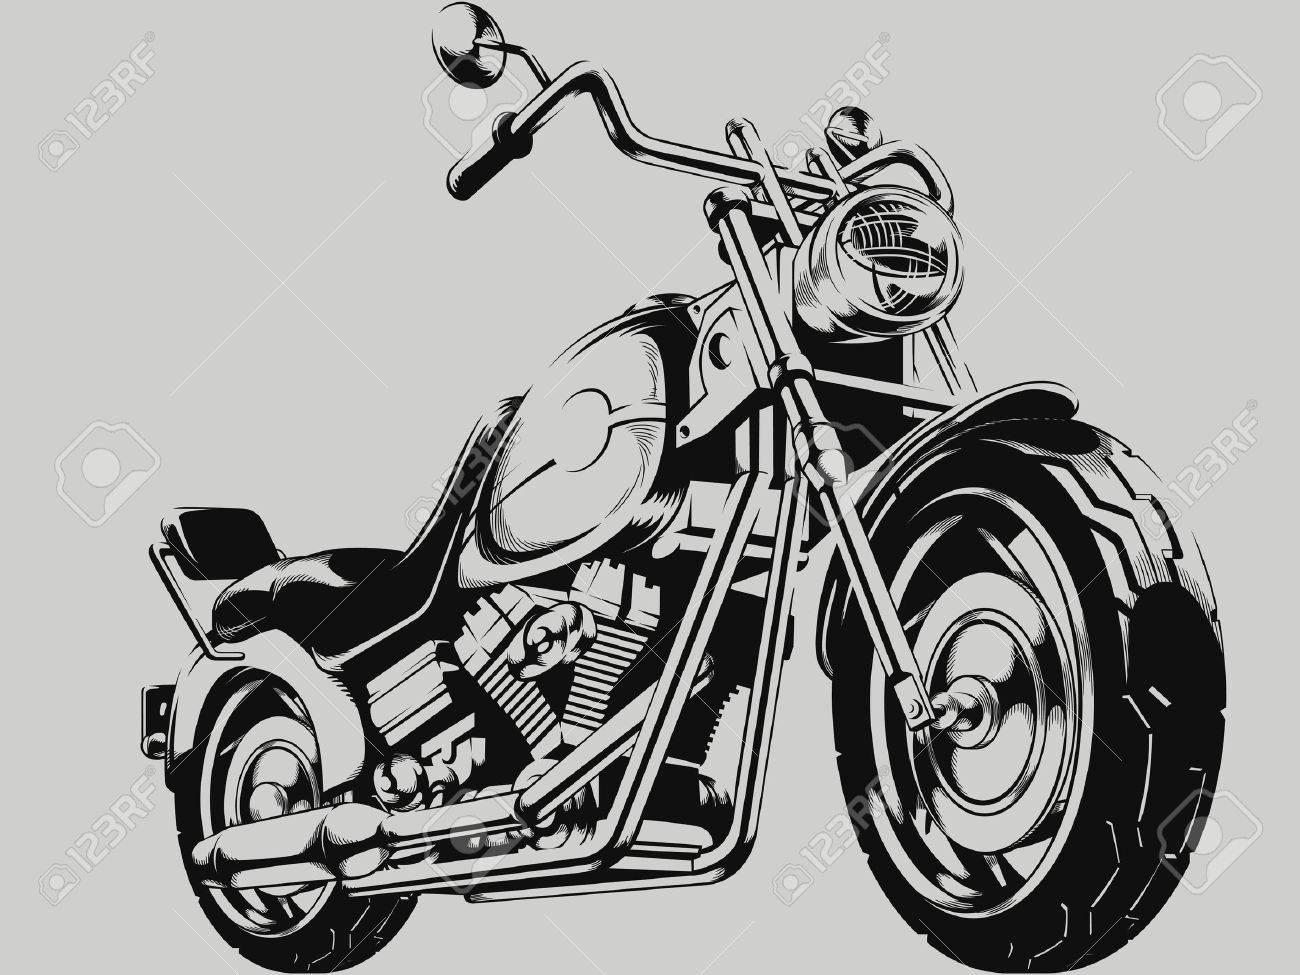 Vintage Motorcycle Vector Silhouette - 44847396